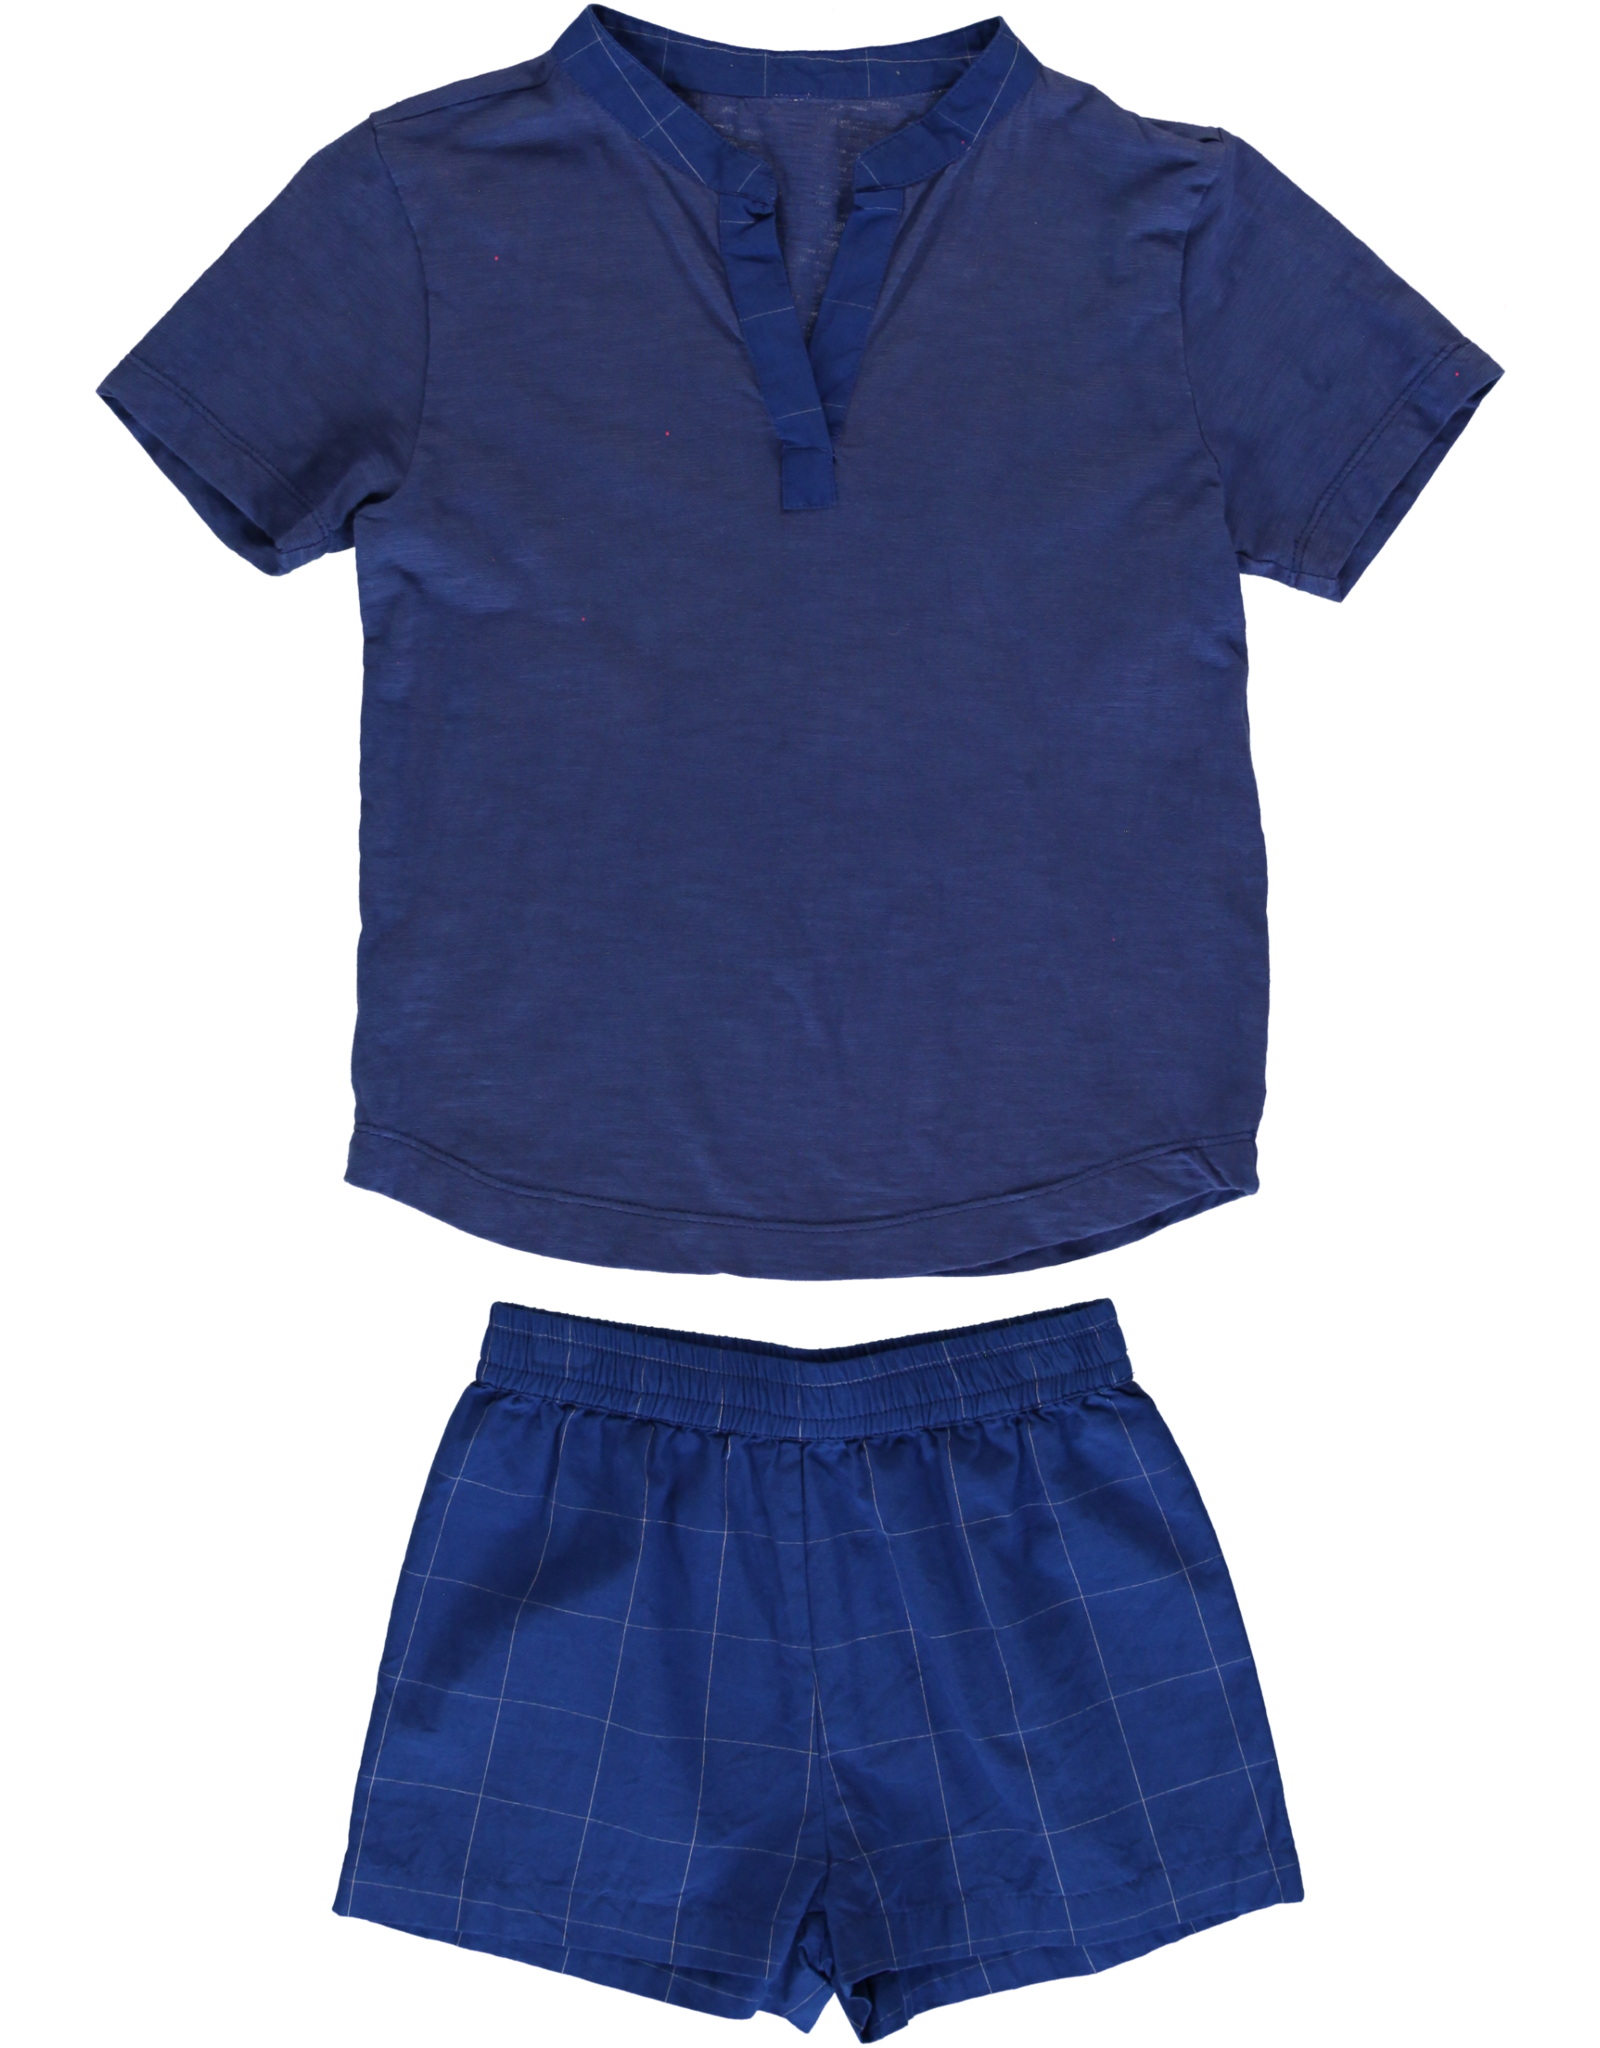 Dorélit Ebre + Mars | Pajama Set Woven | Check Blue